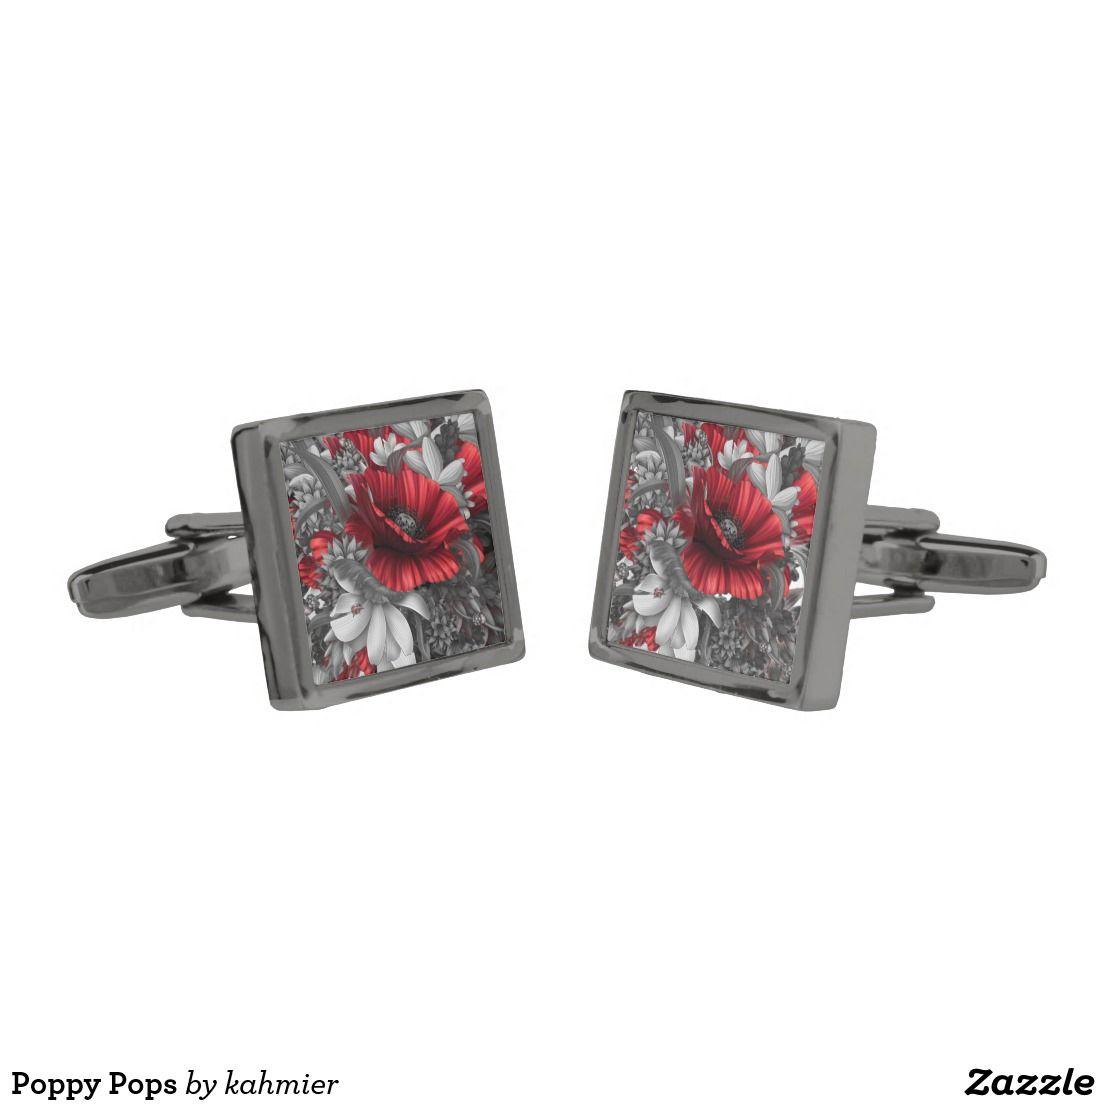 Poppy Pops Gunmetal Finish Cufflinks | Gifts For Him | Pinterest